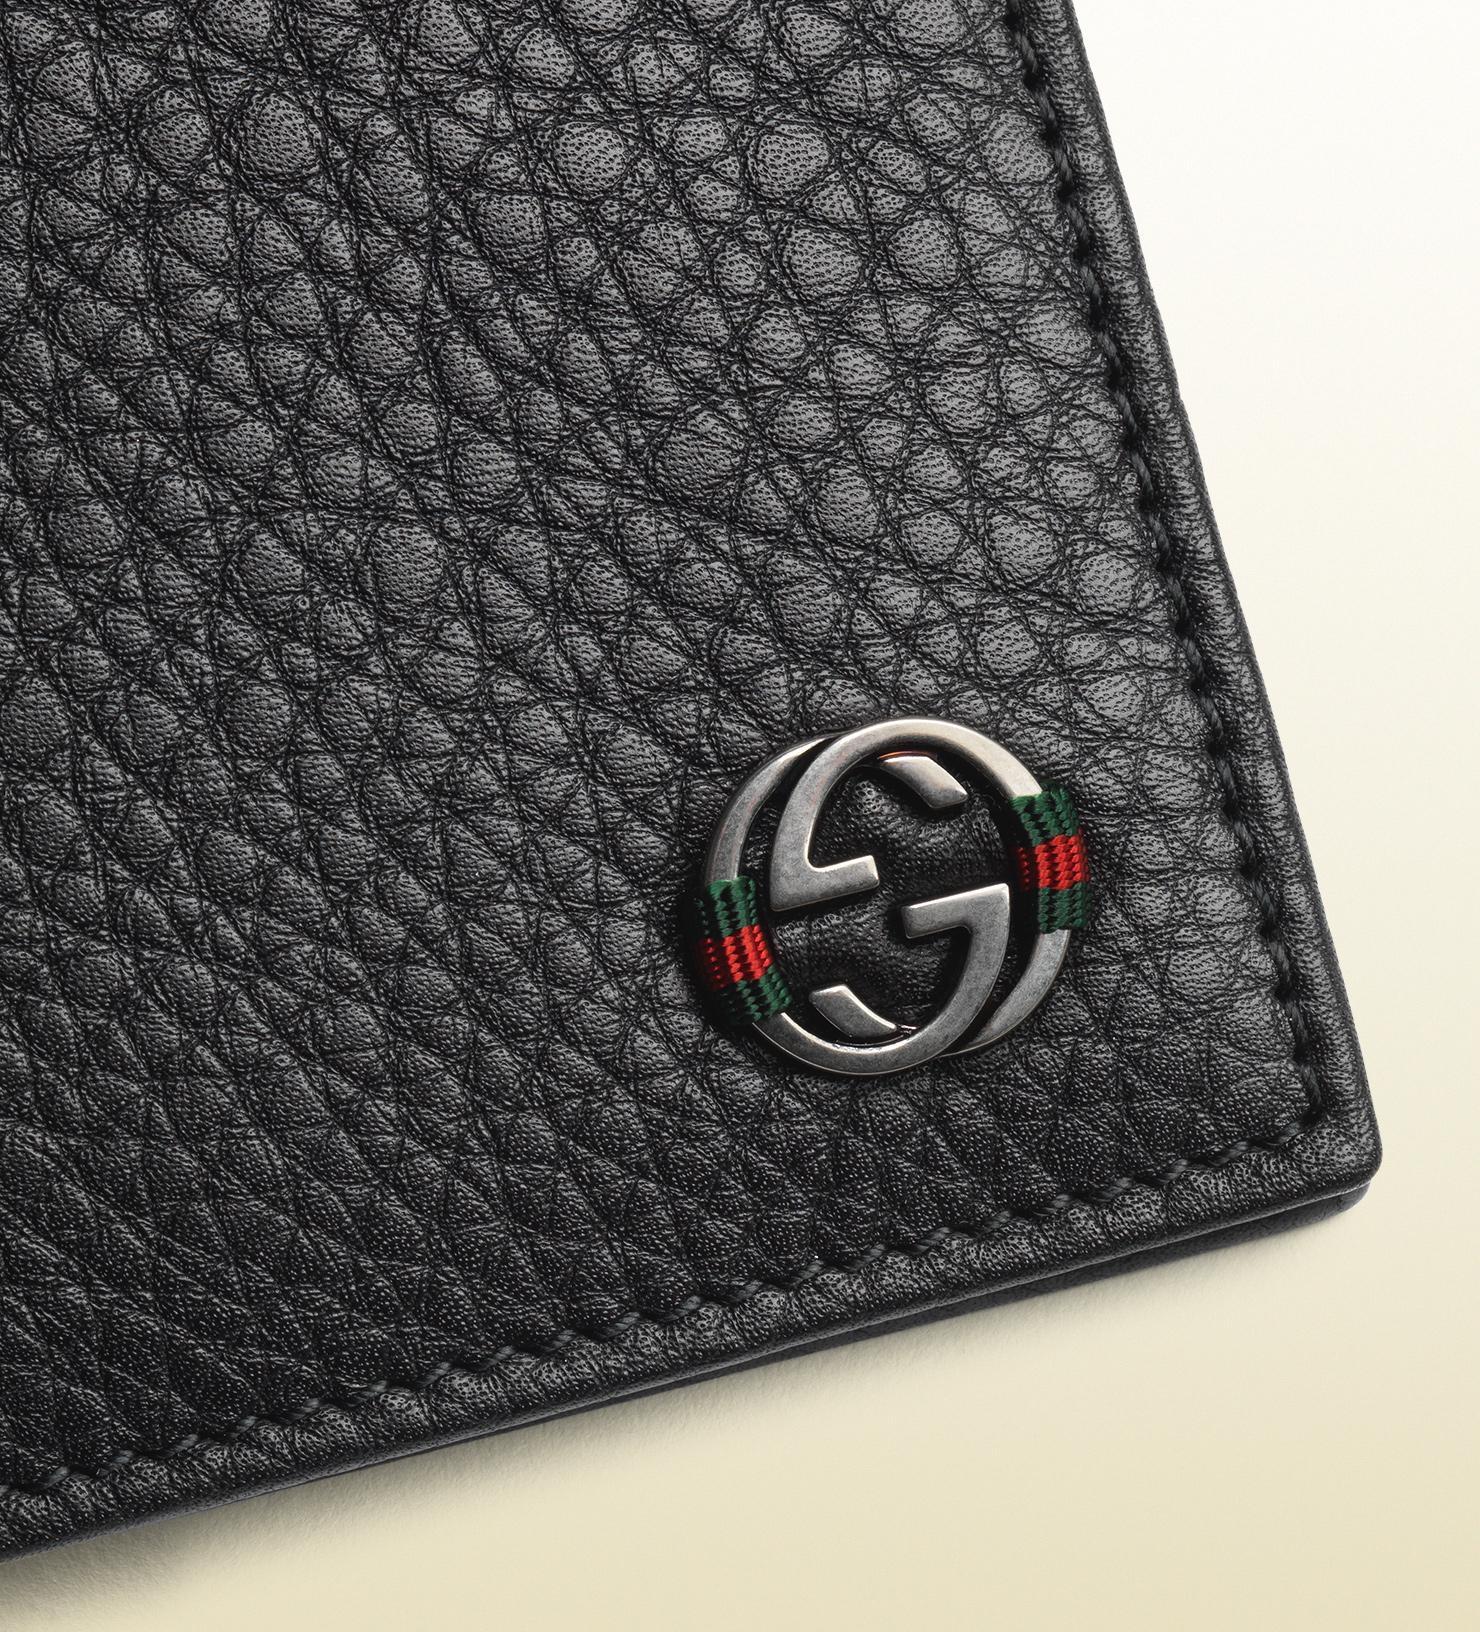 dc12780f0fad Gucci Wallet Bifold - Best Photo Wallet Justiceforkenny.Org